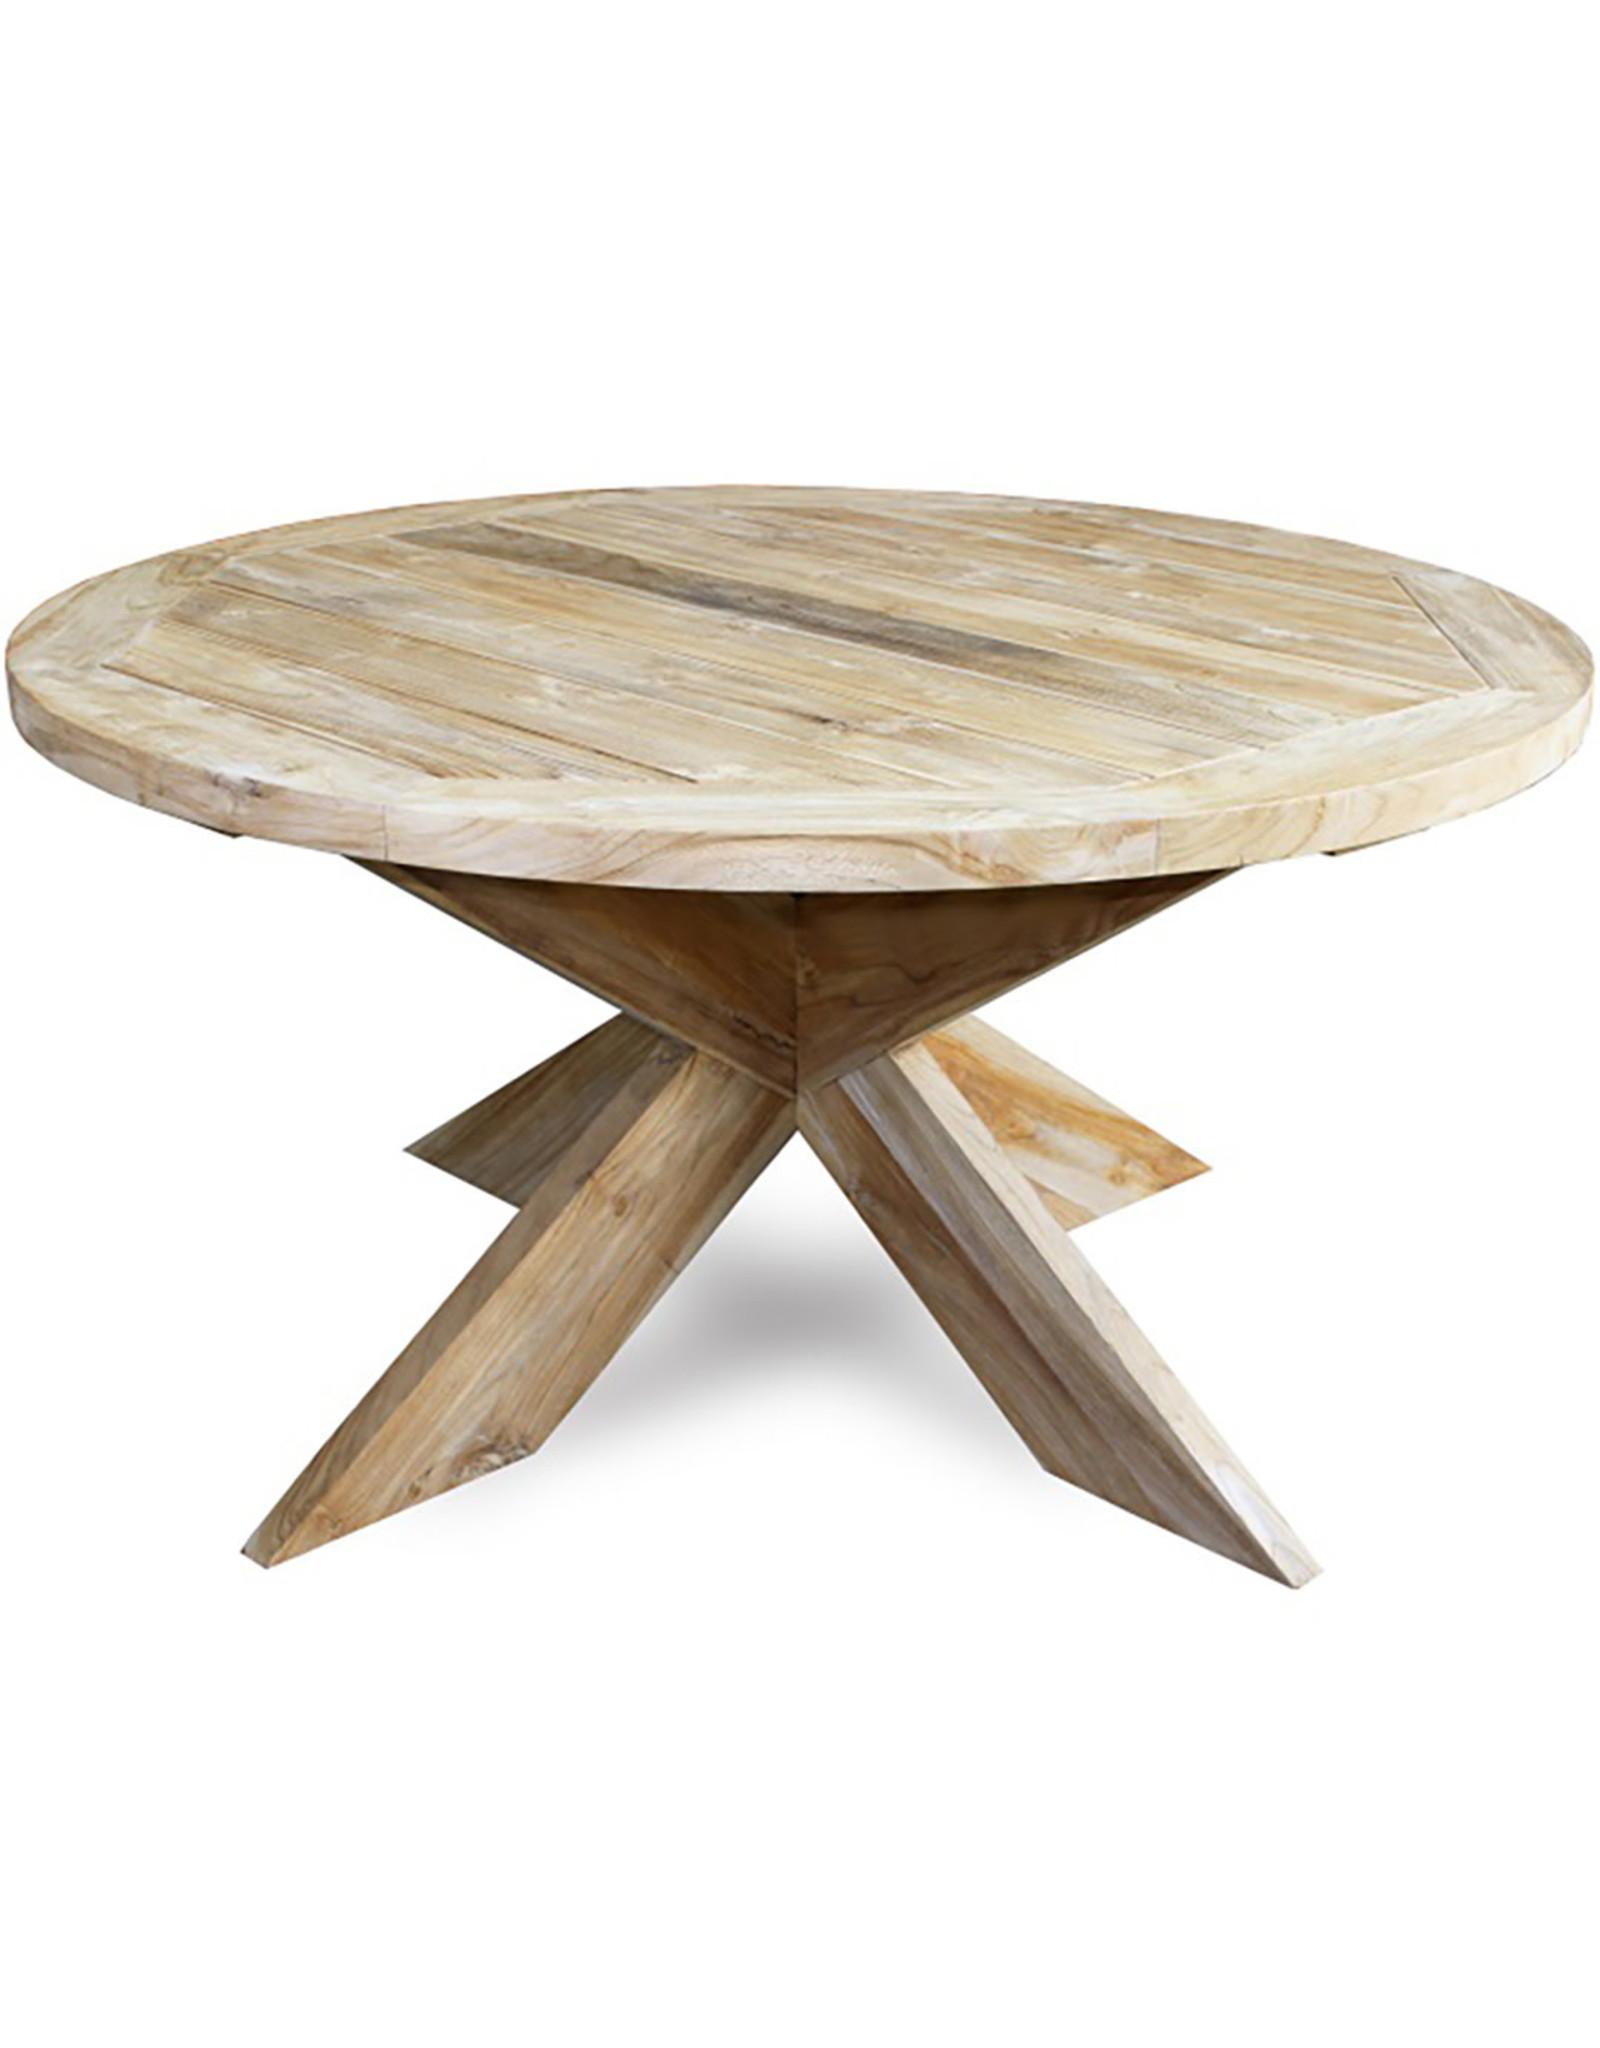 Van der Leeden Mandwerk Dining Table Teakwood X-Leg